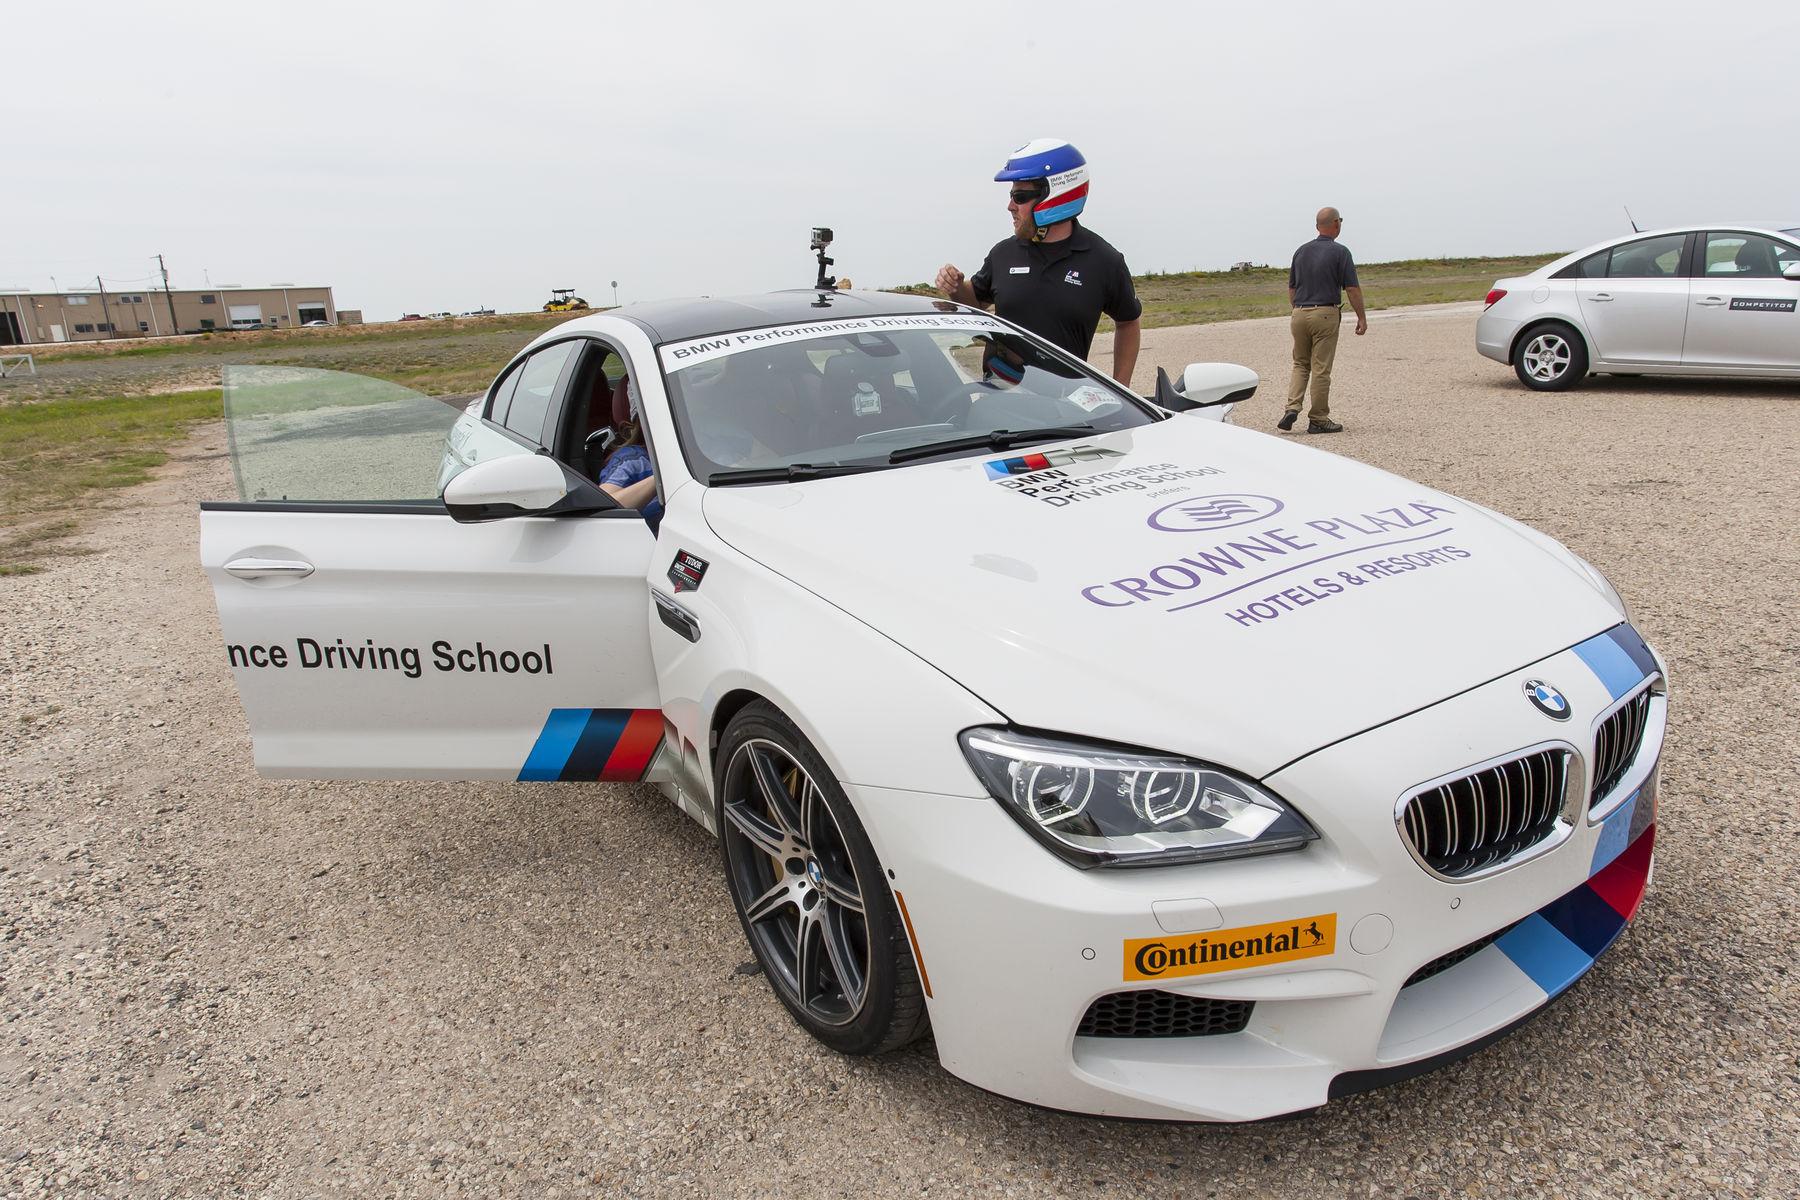 | BMW Driving School Drift car, lets do this!